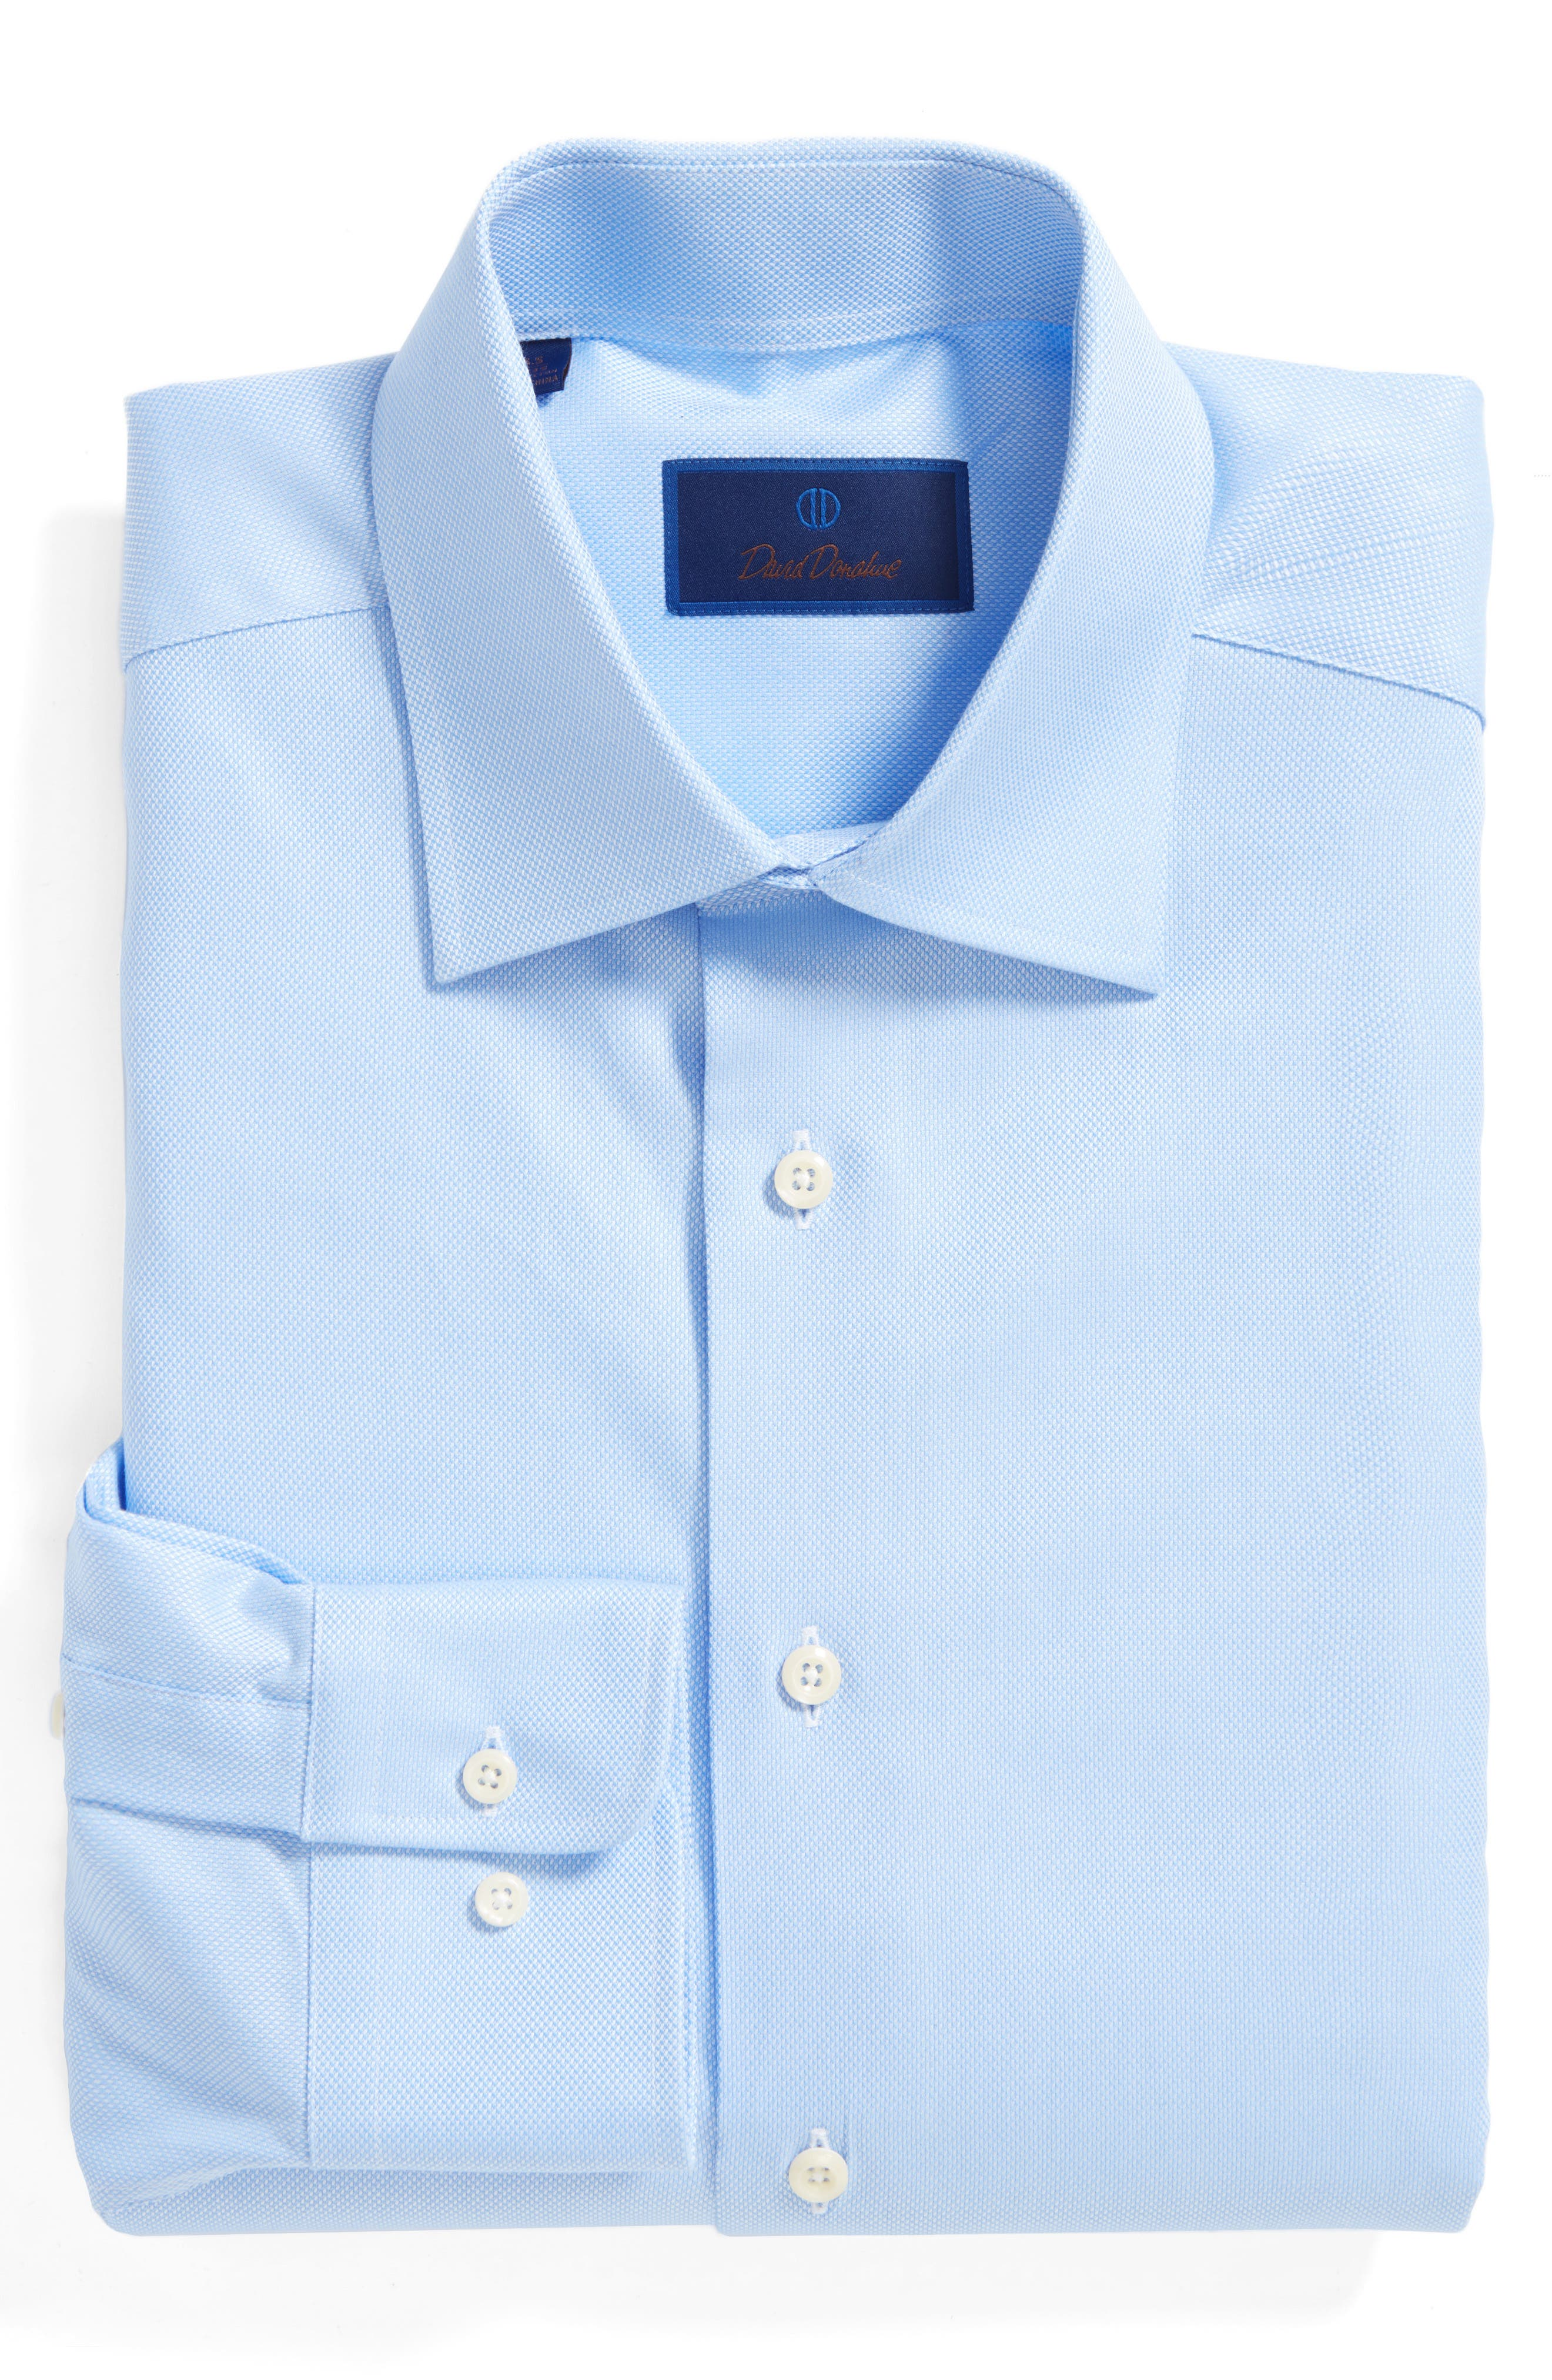 Main Image - David Donahue Regular Fit Oxford Dress Shirt